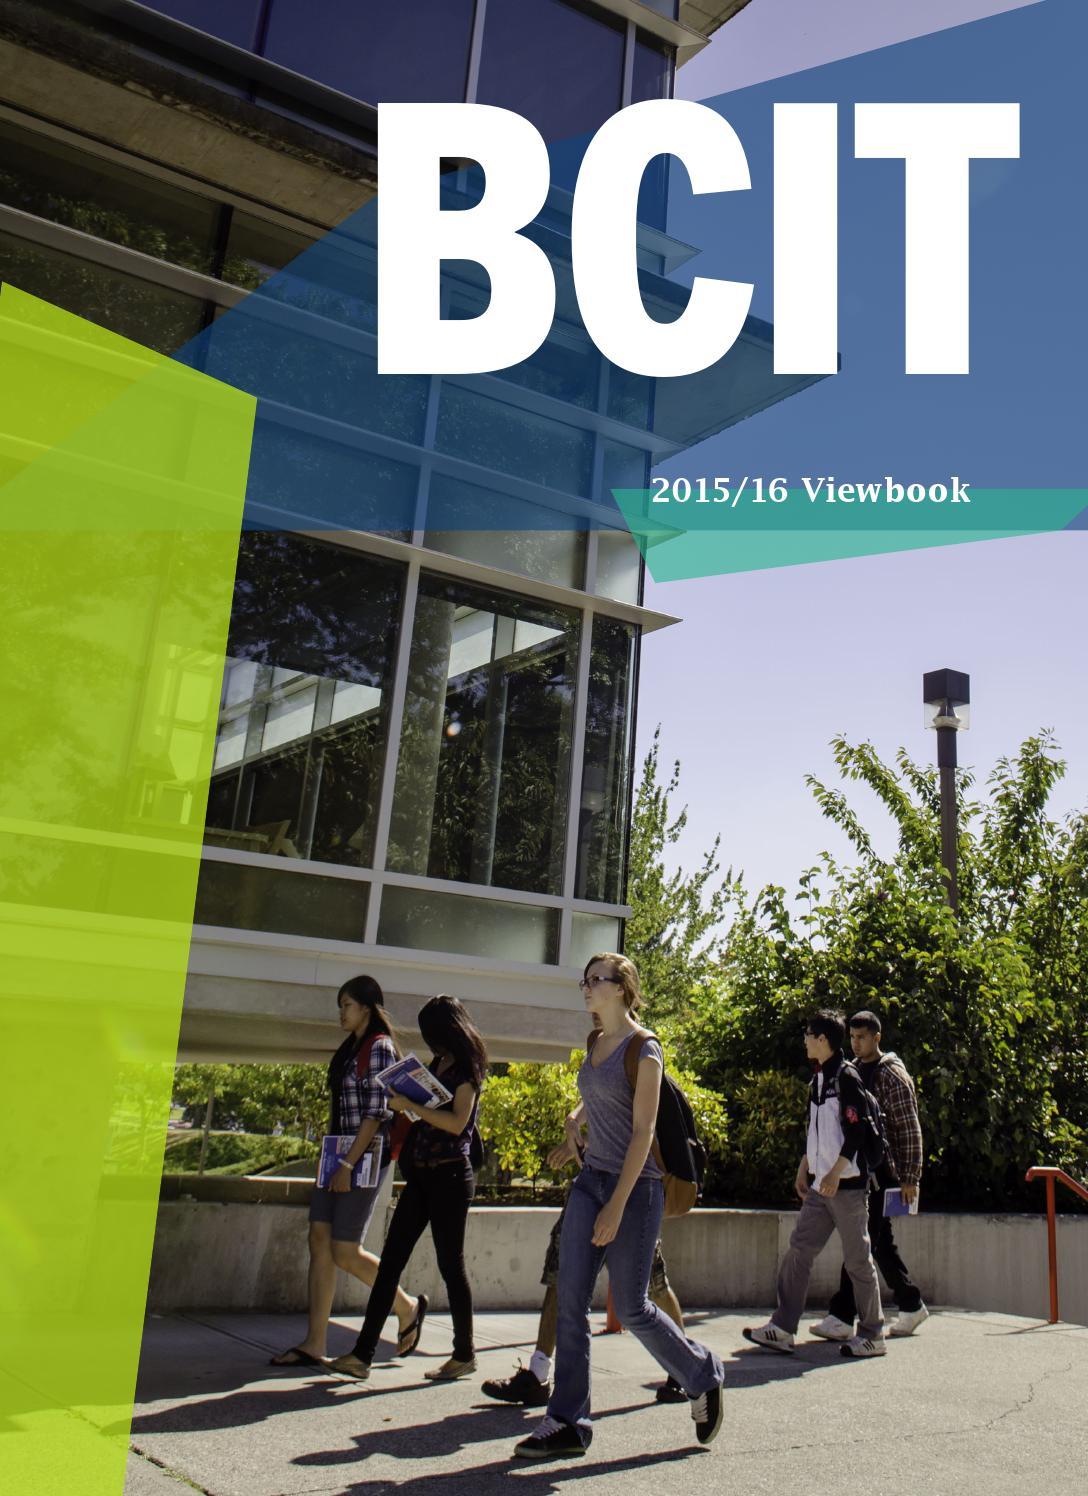 Bcit Viewbook 2015 2016 By Bcit Issuu